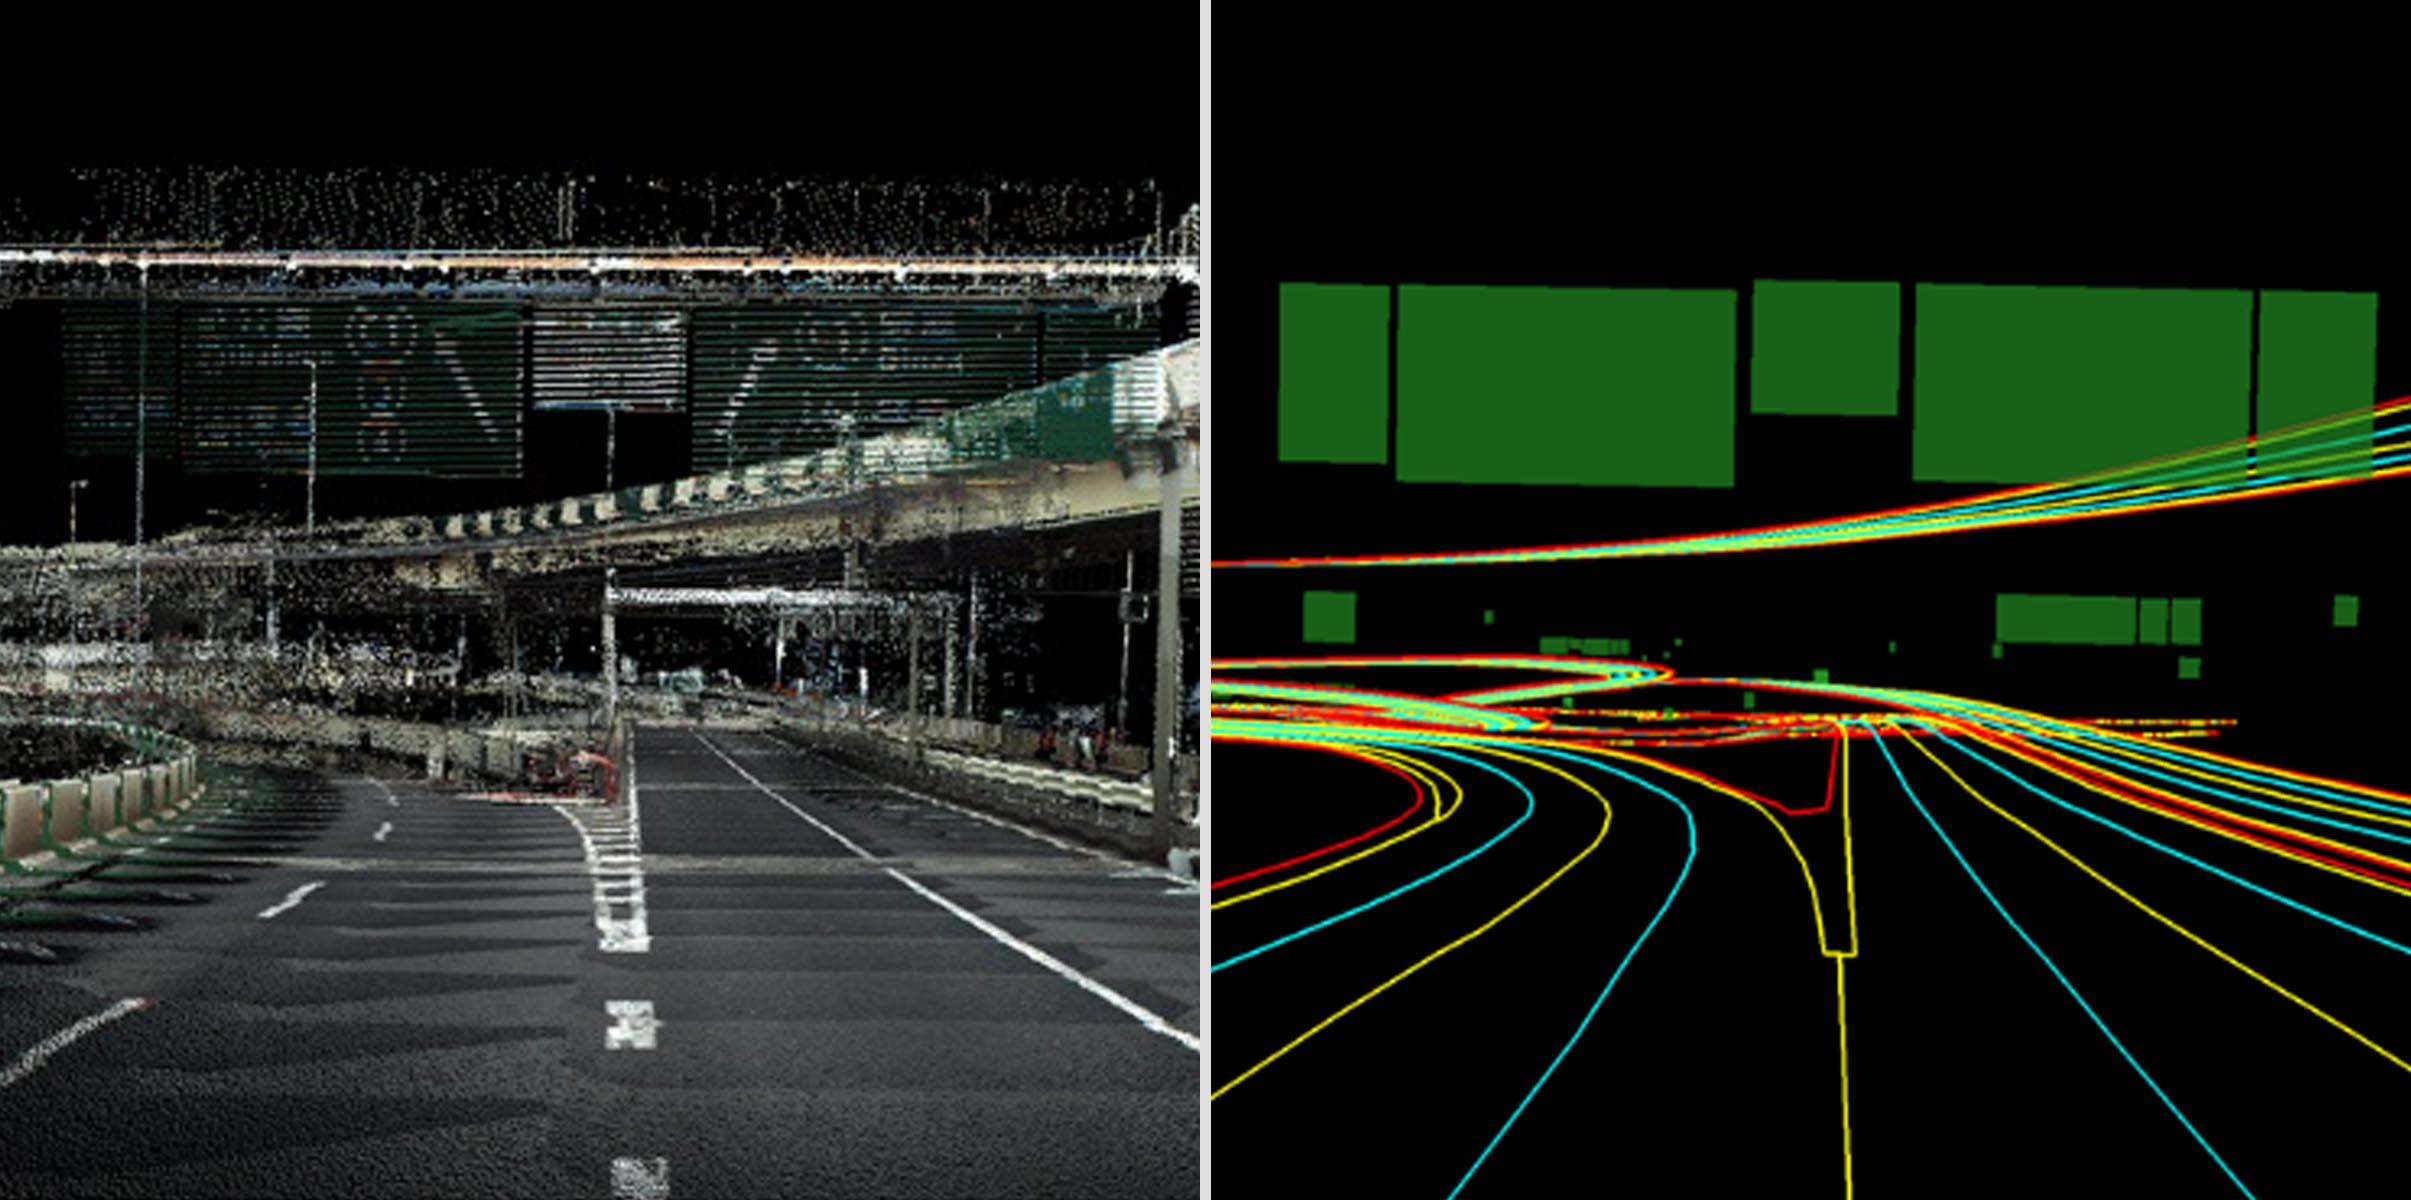 3D MapAutonomous Driving 3D Map